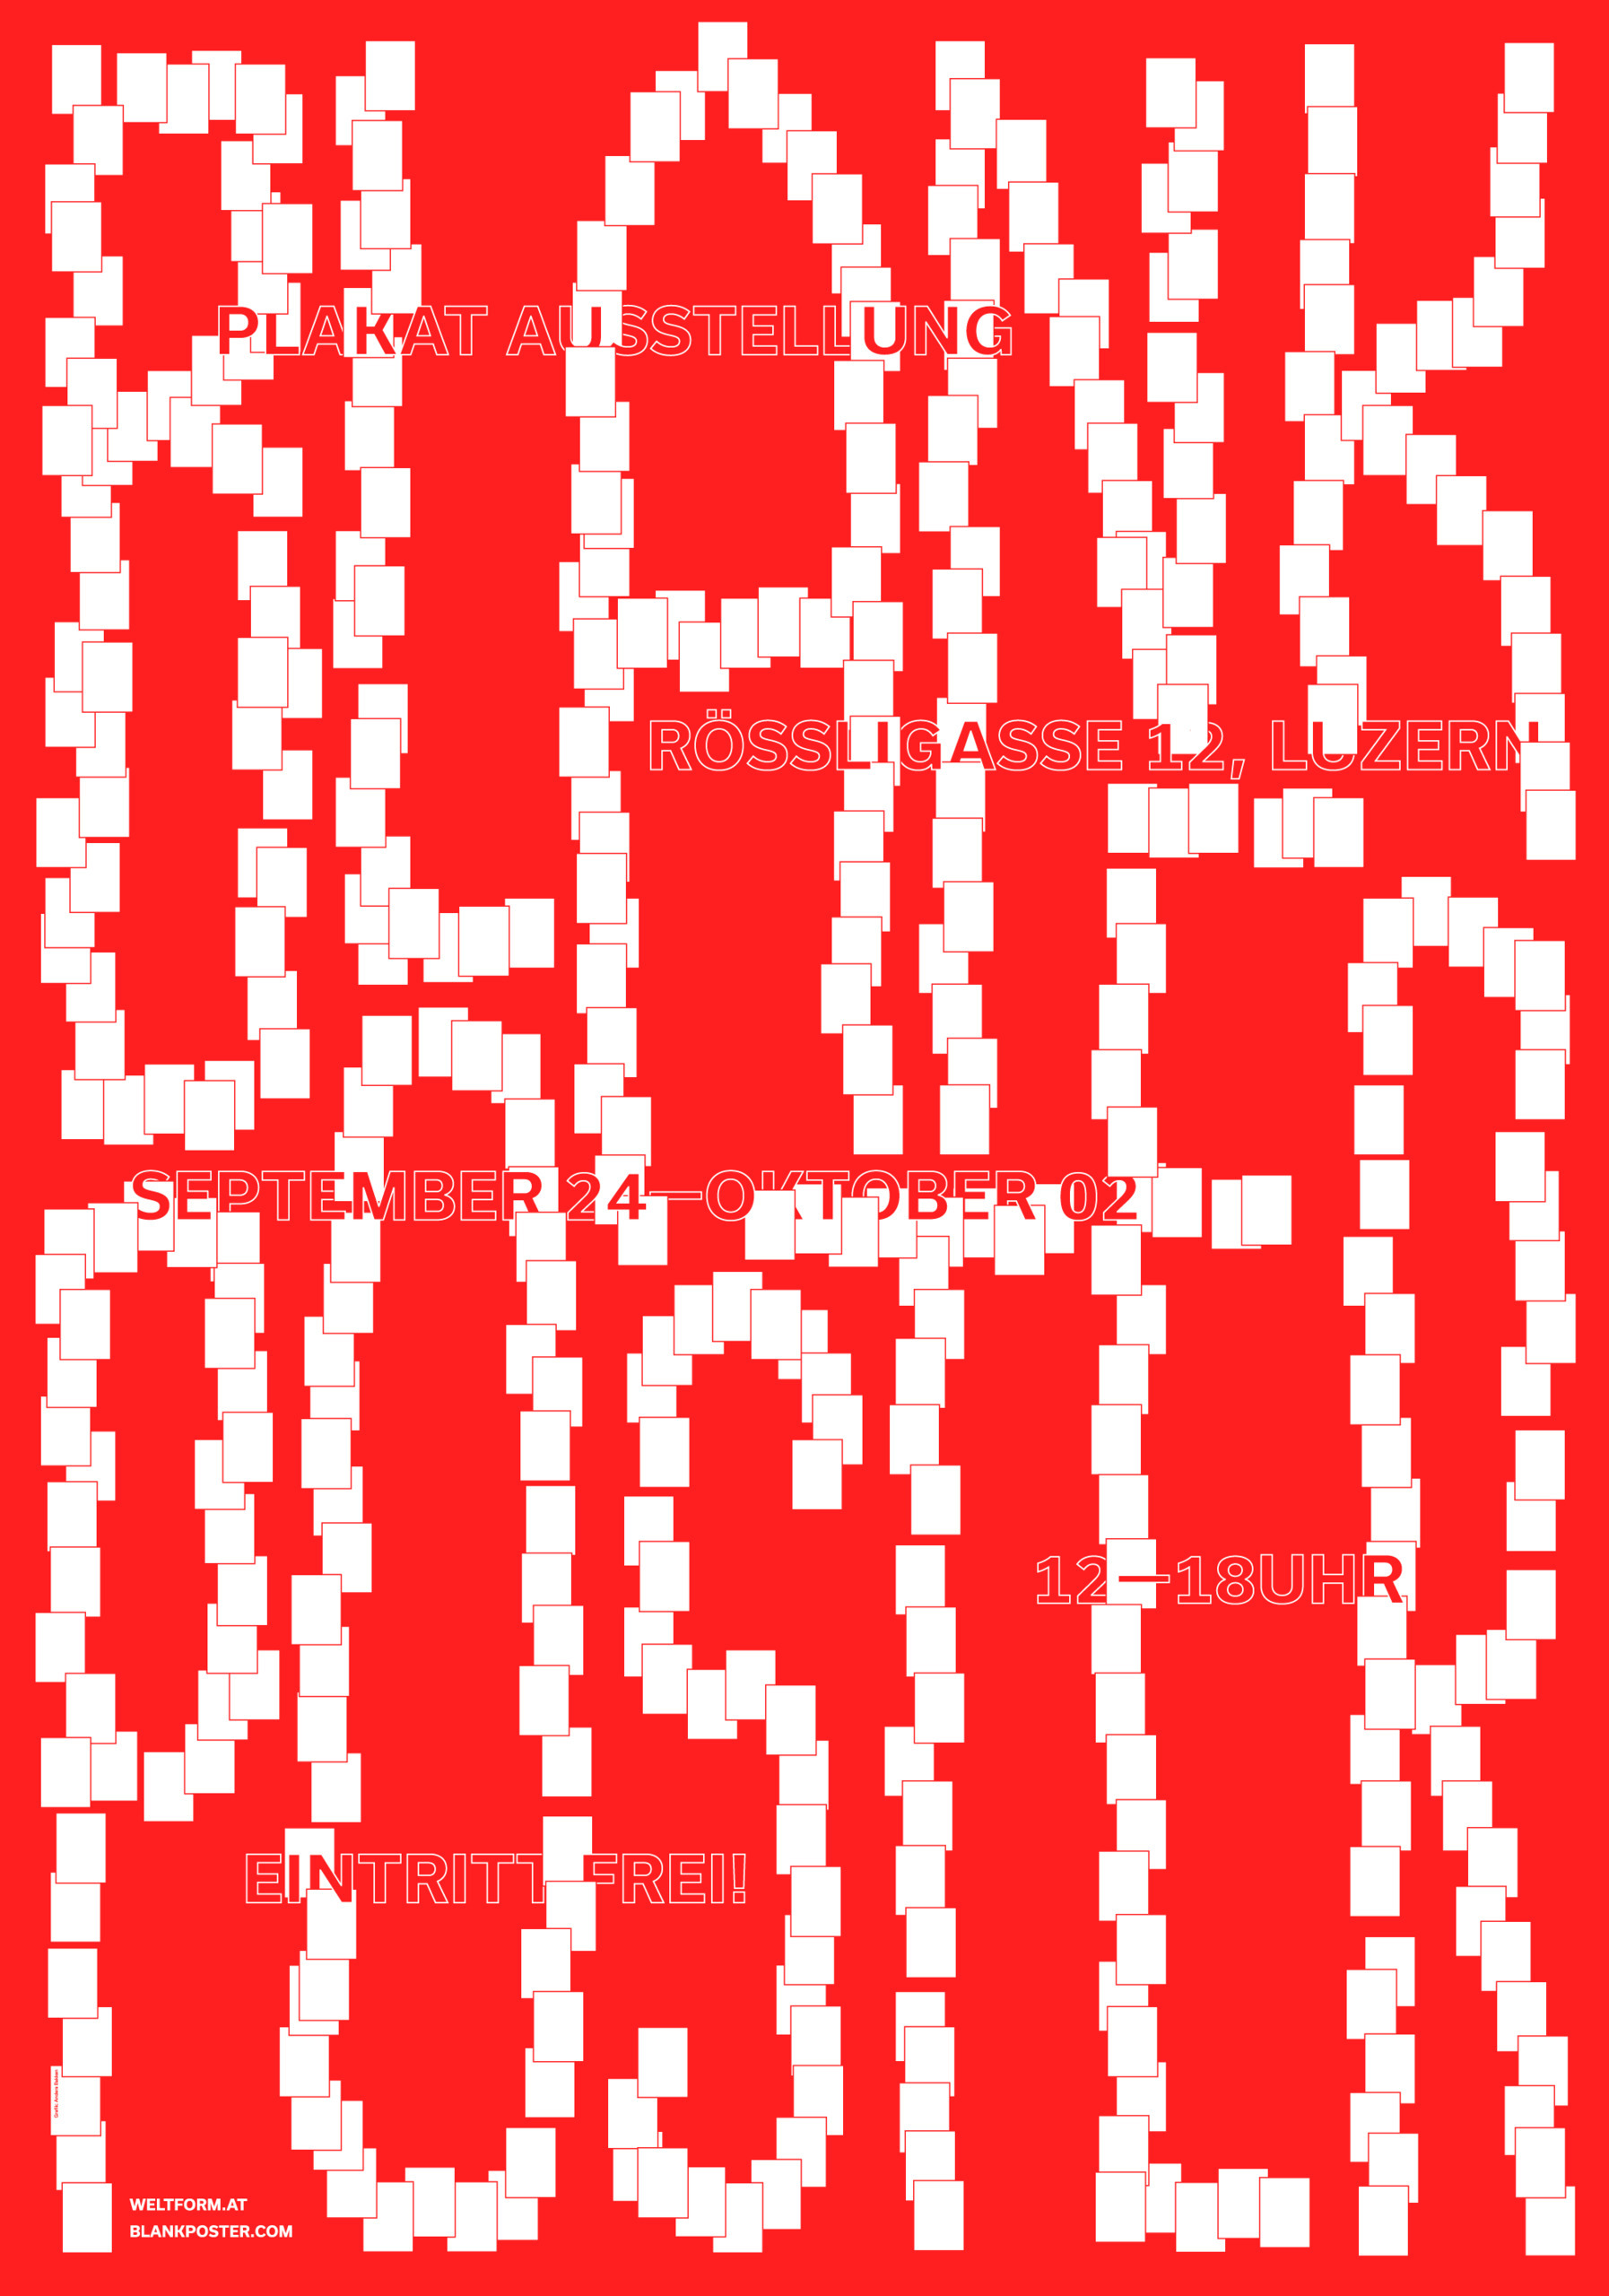 Promotional poster Blank Poster - andersbakken | ello